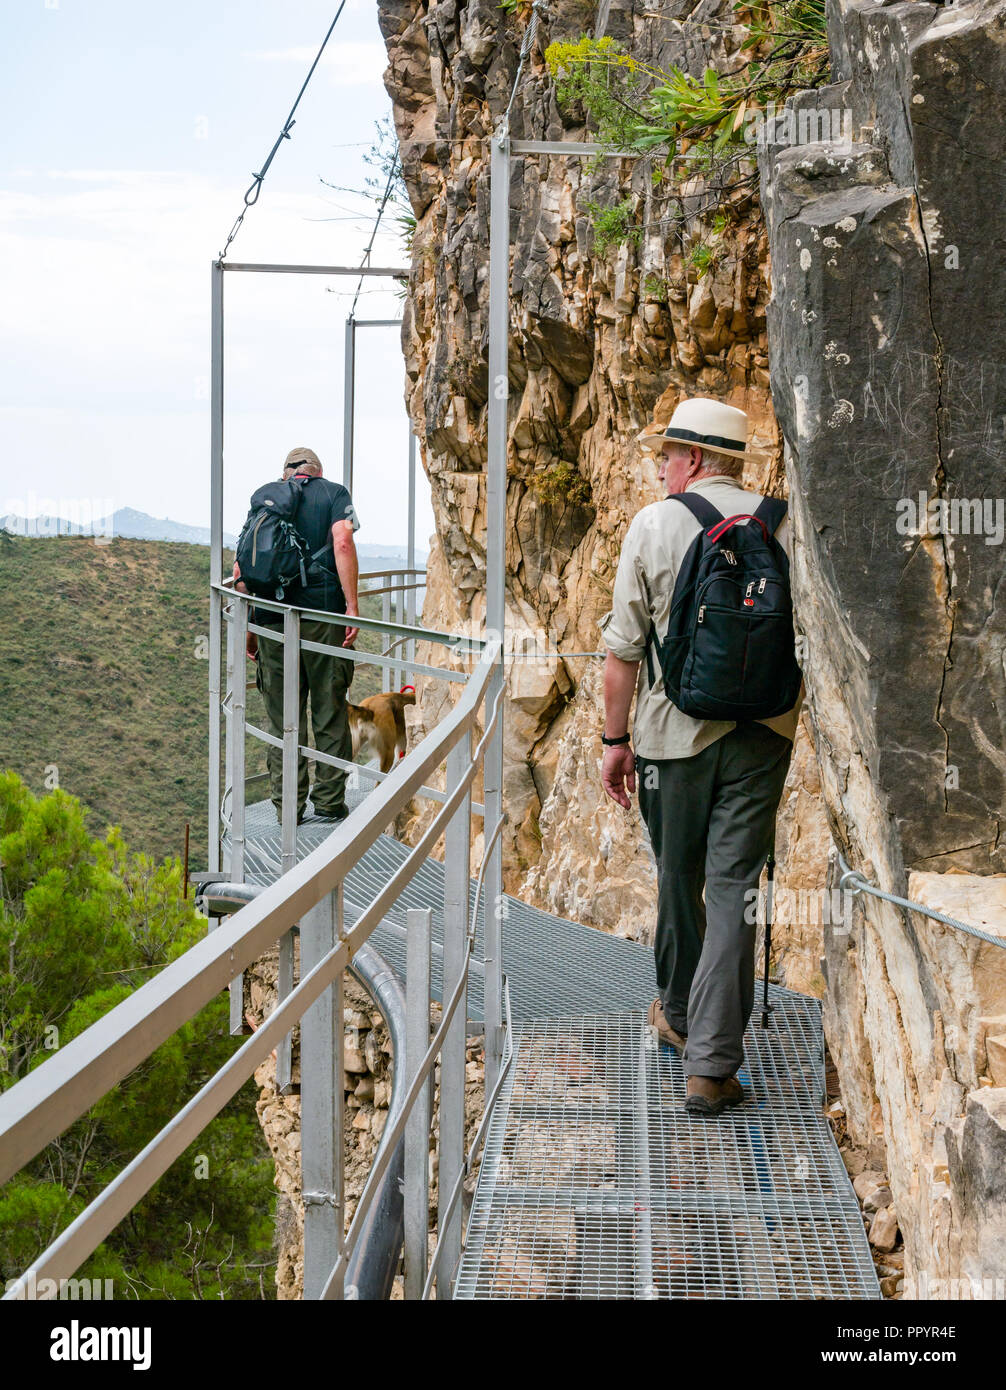 Older men walking on mountain gorge cliff metal walkway, Sierras de Tejeda Natural park, Axarquia, Andalusia, Spain - Stock Image